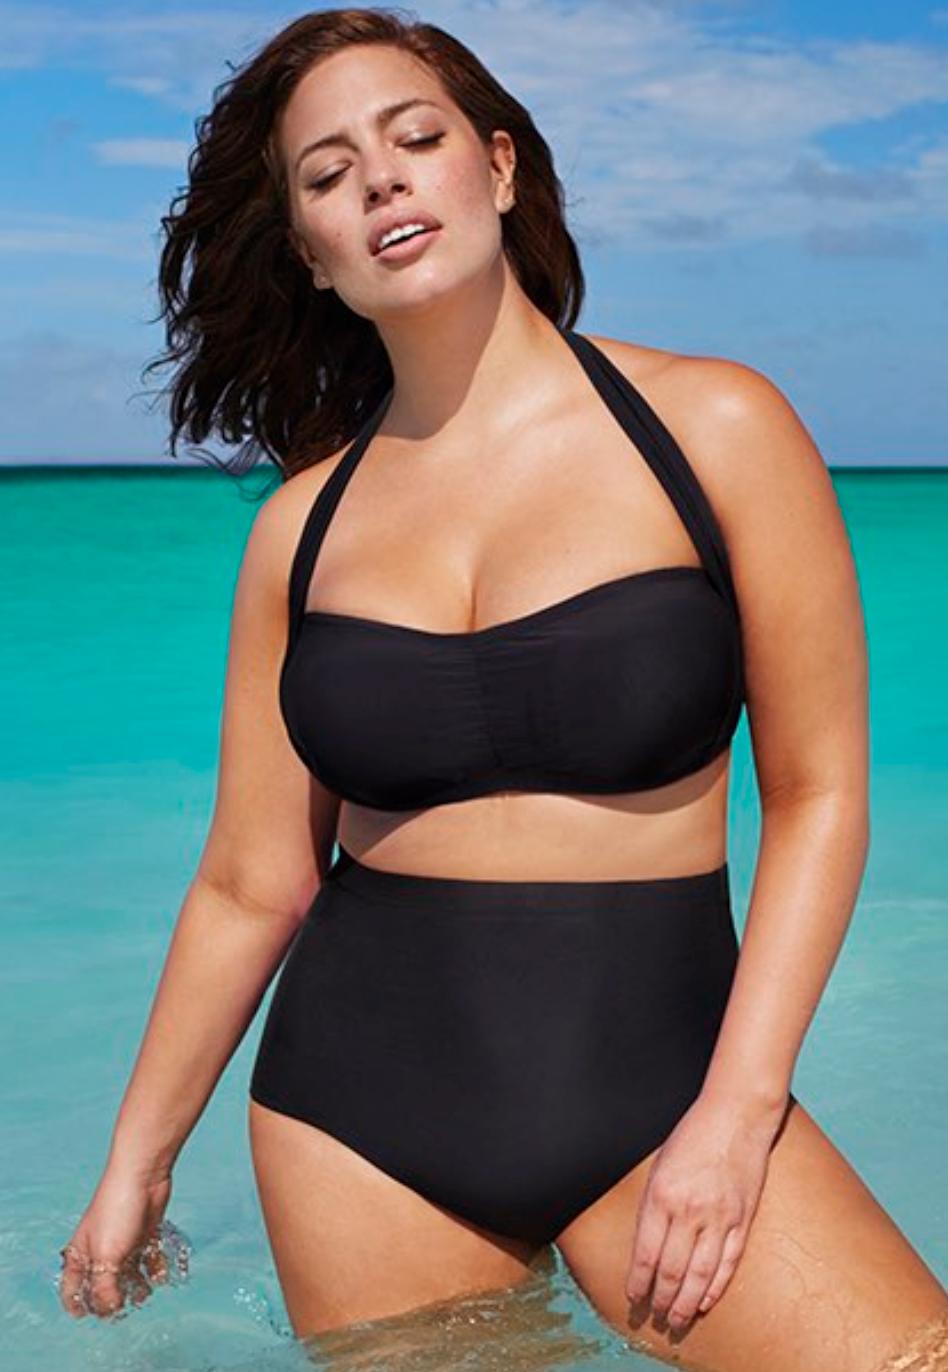 Swim Sexy The Icon Black High Waist Bikini 43.40$